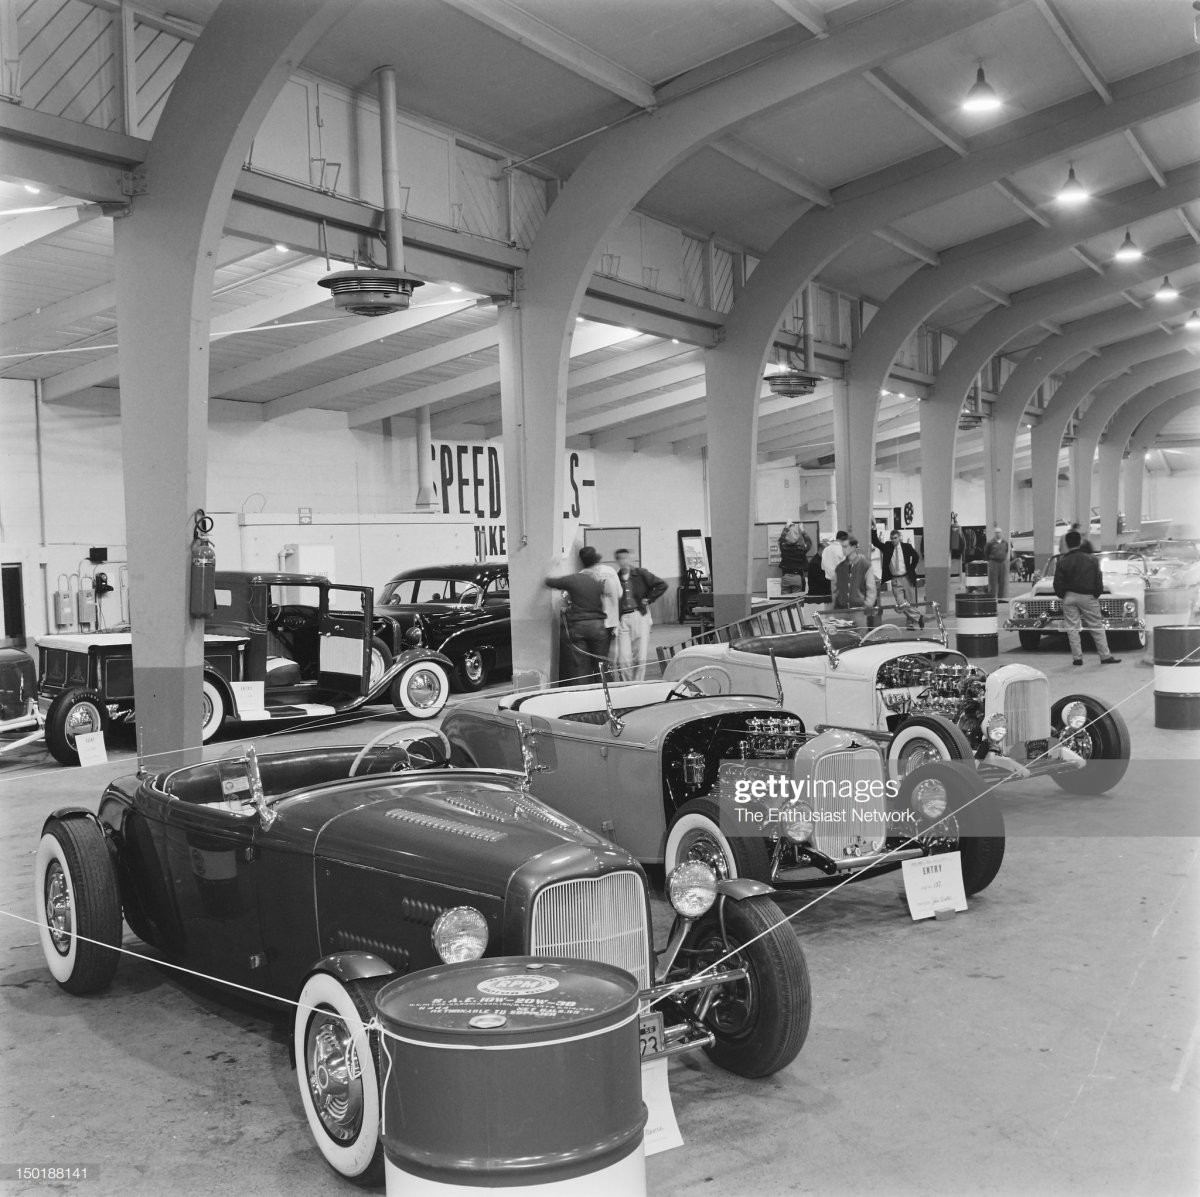 59 1957 Car Show - San Jose, California..jpg